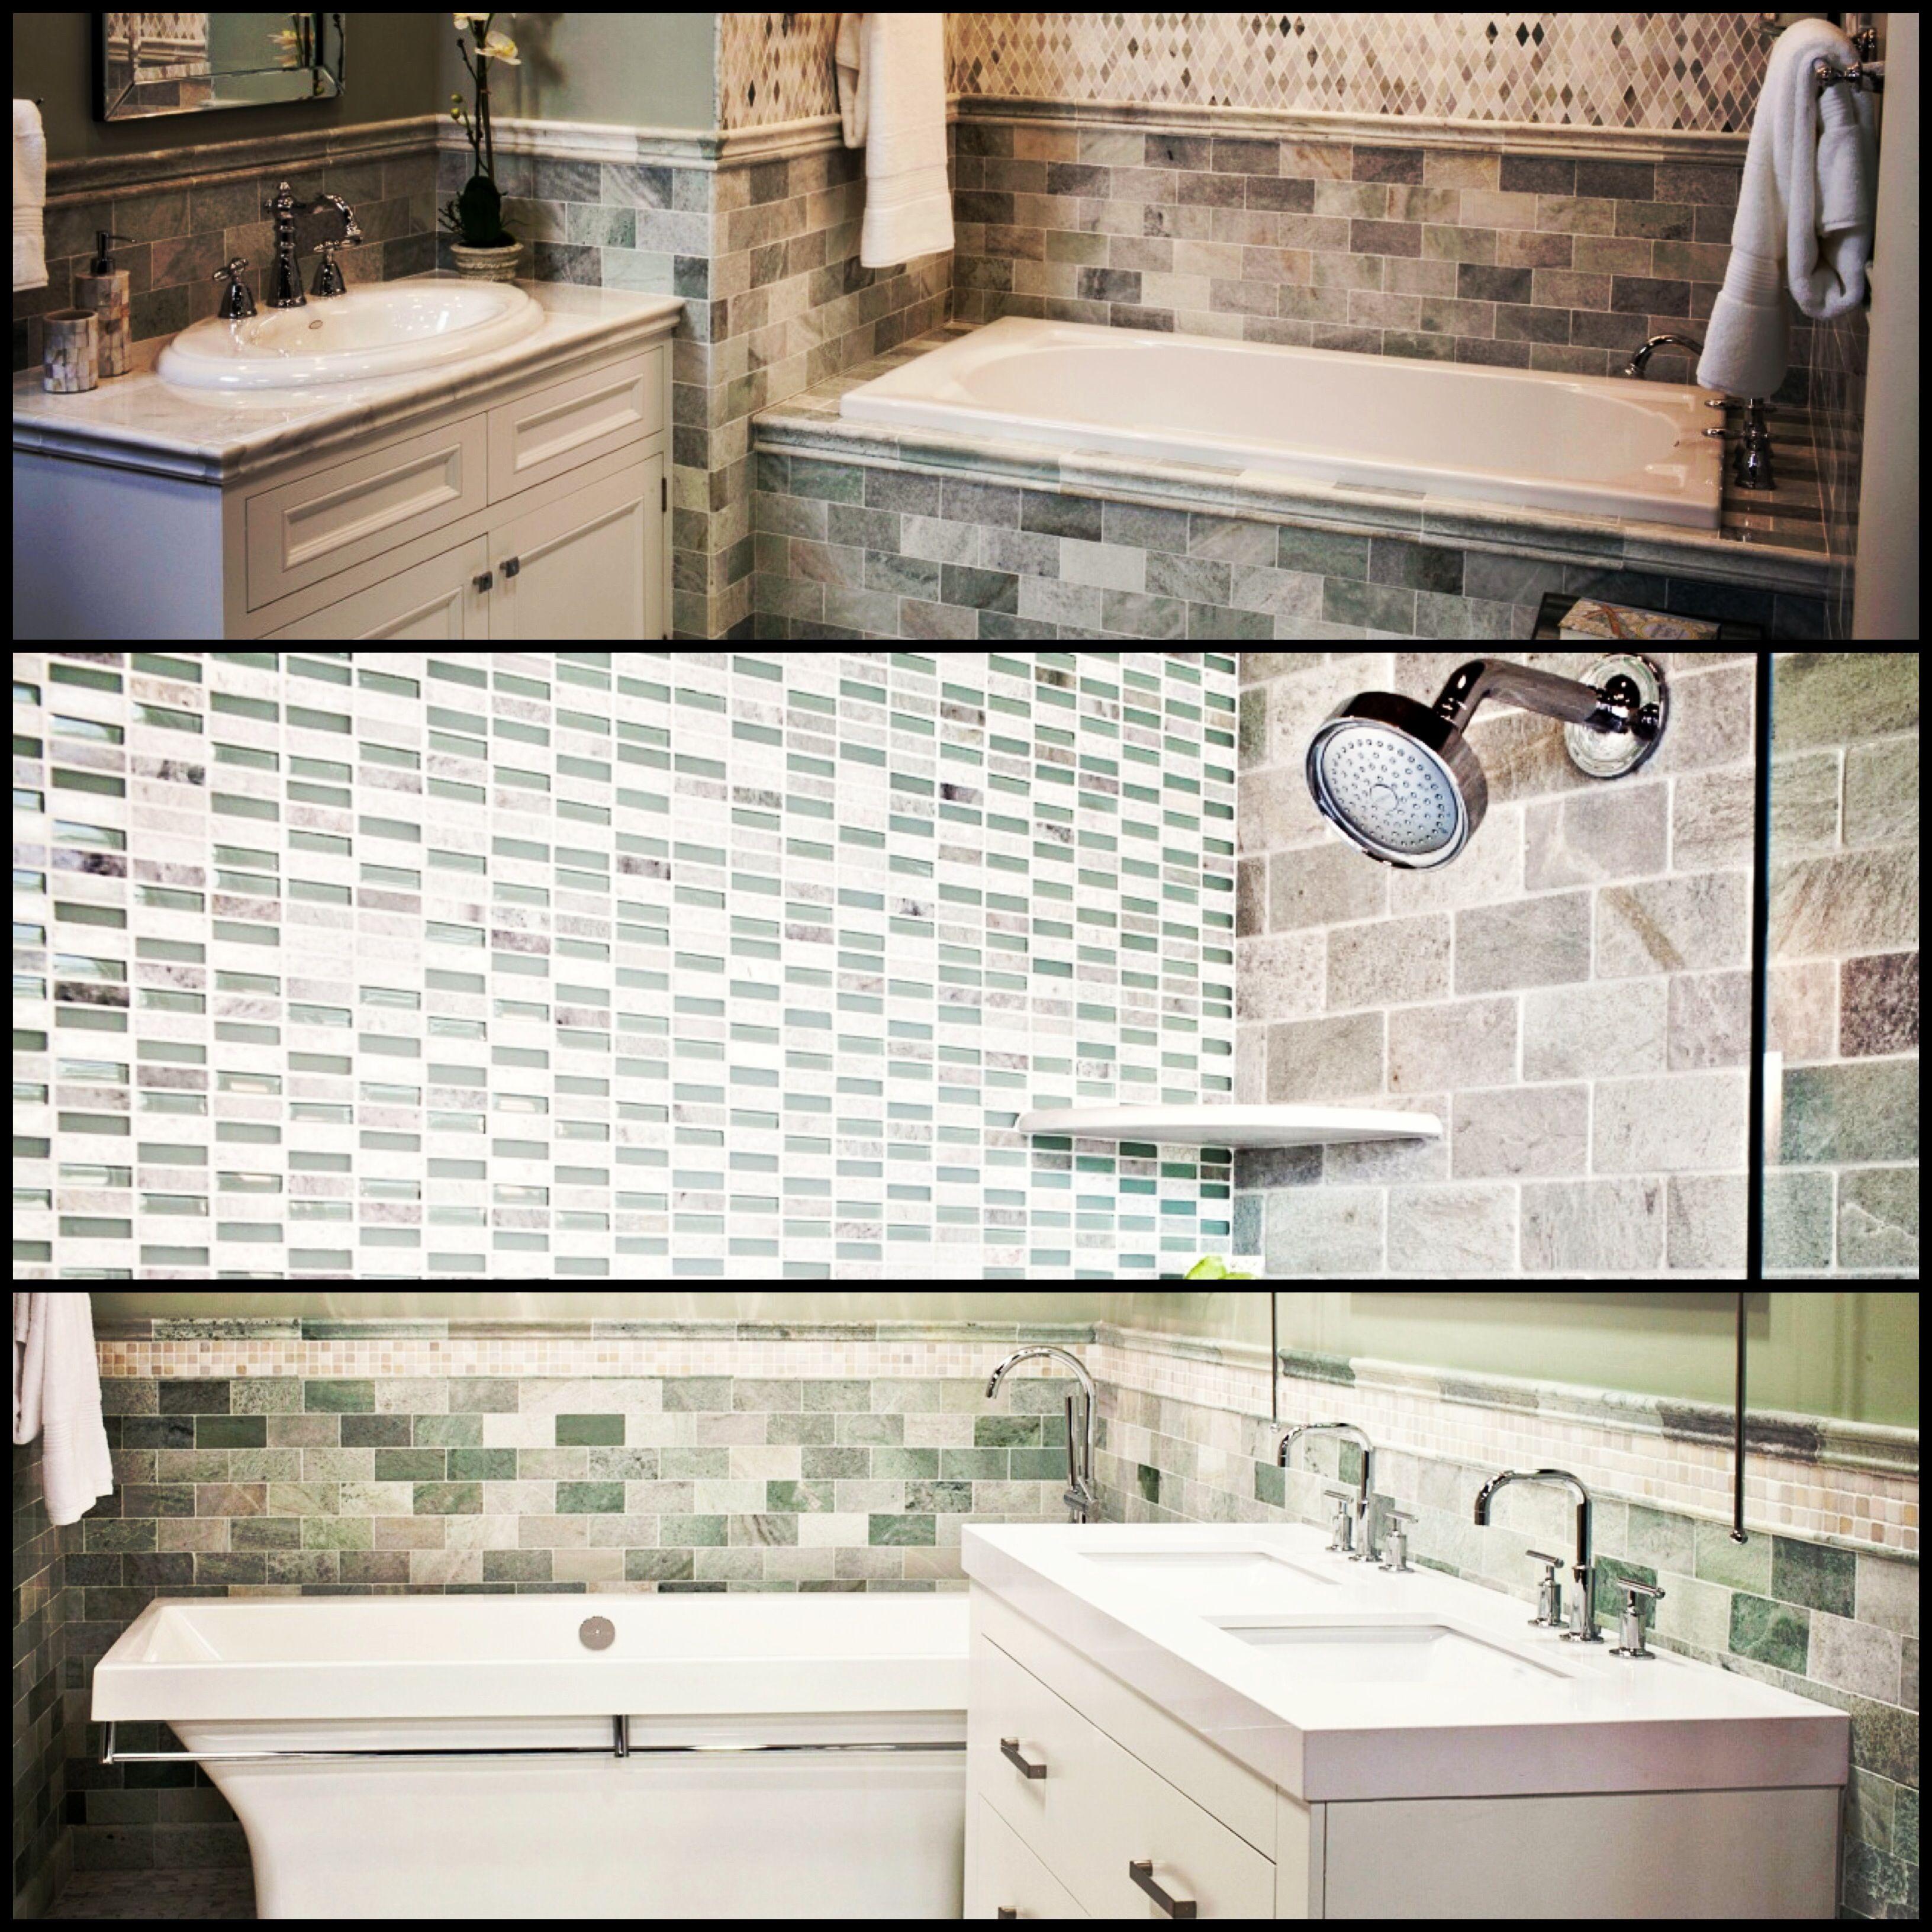 The beautiful Biltmore Marble Bathrooms The beautiful